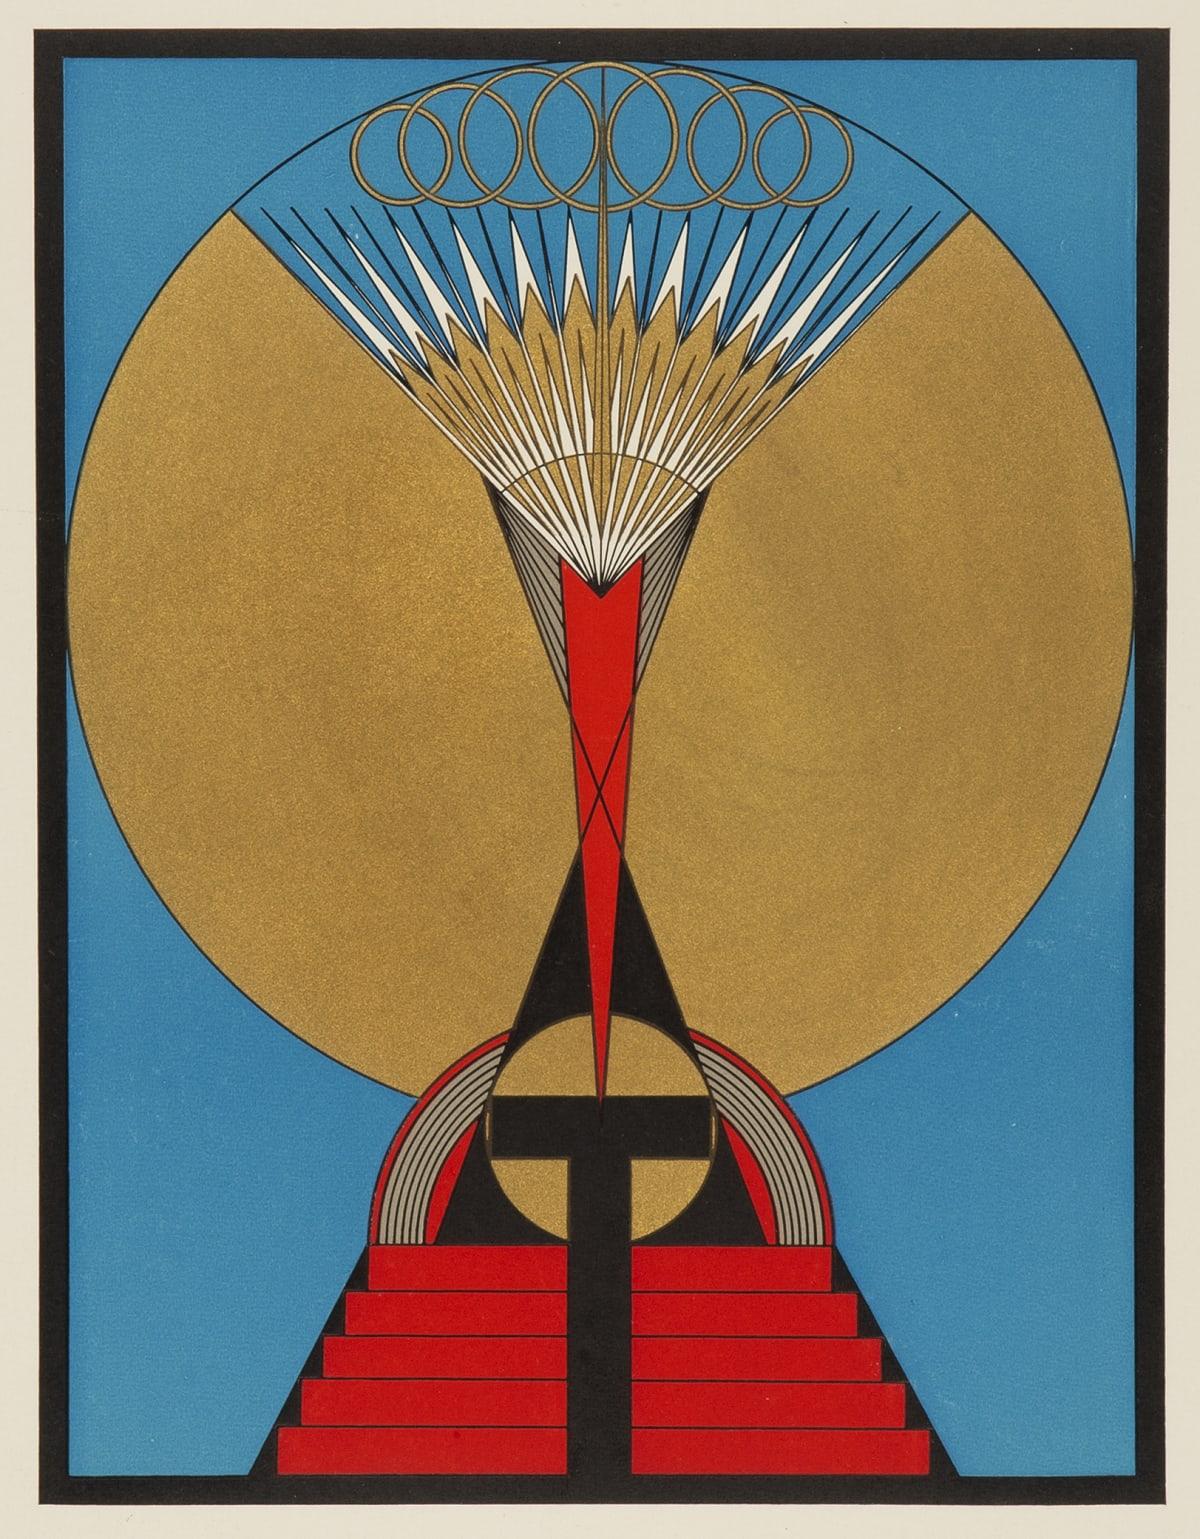 Olga Fröbe-Kapteyn The Light of the Soul, c.1930 Screenprint Paper Size: 49.5 x 36 cm Edition size unknown